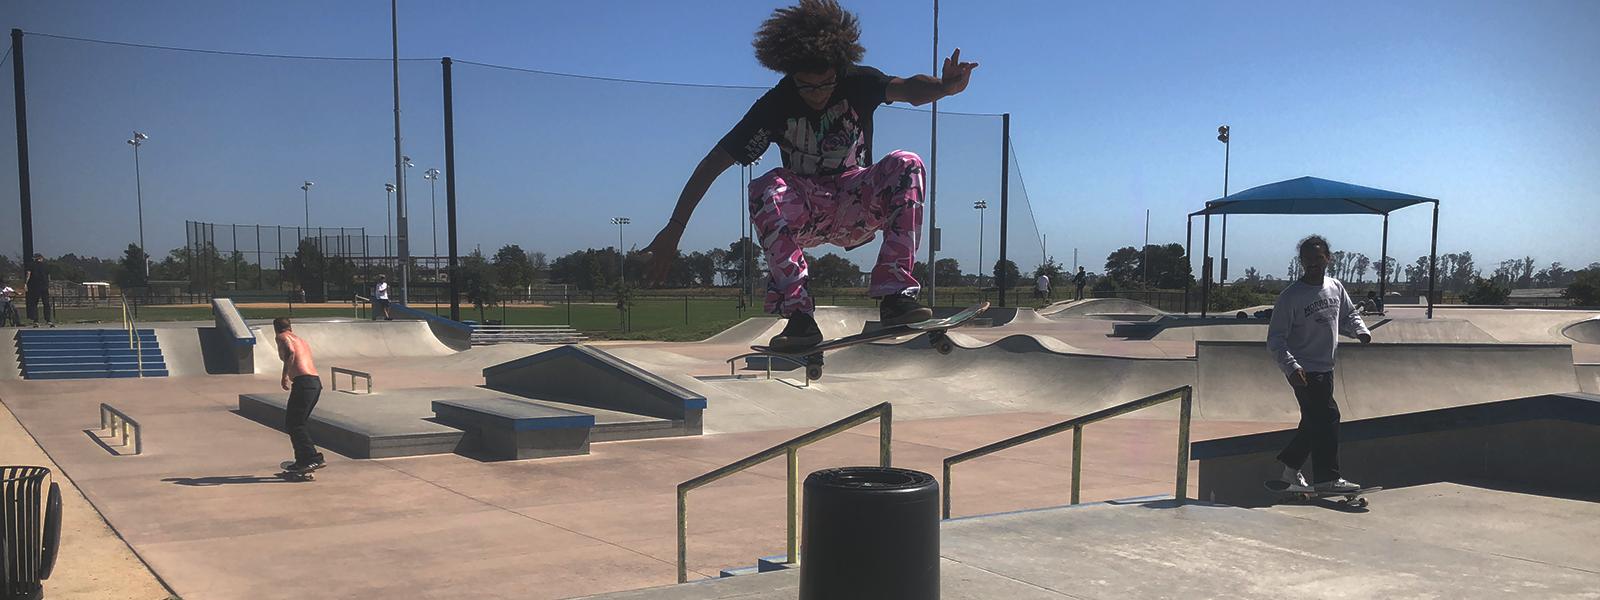 6/26Napa Skate Trip - 8 AM - 9 PM